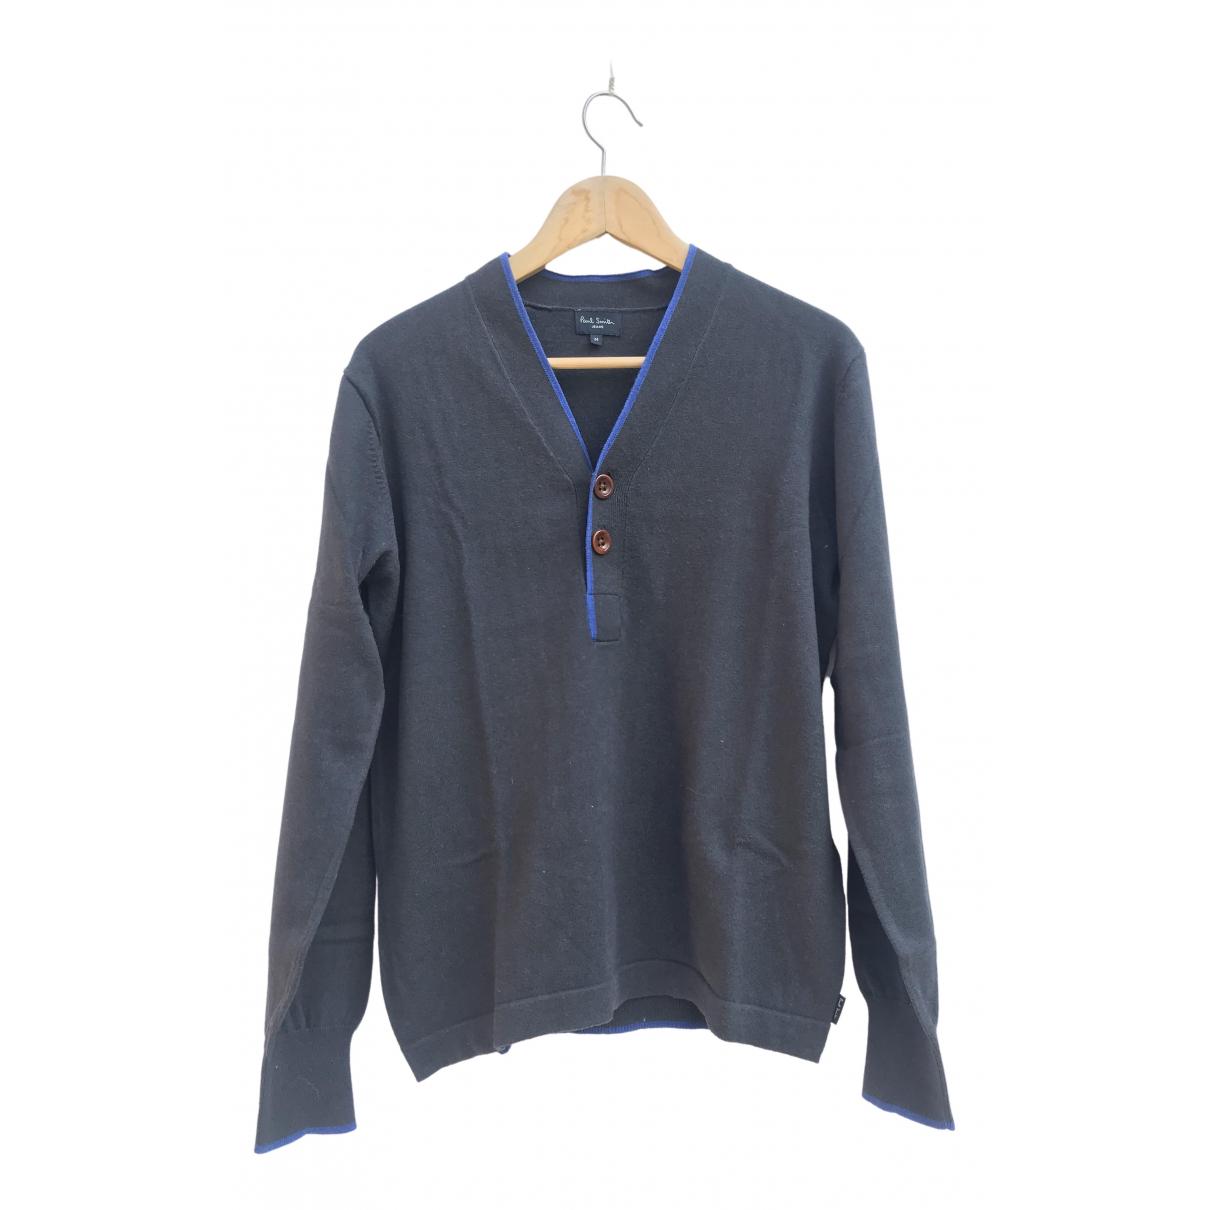 Paul Smith \N Grey Wool Knitwear & Sweatshirts for Men M International